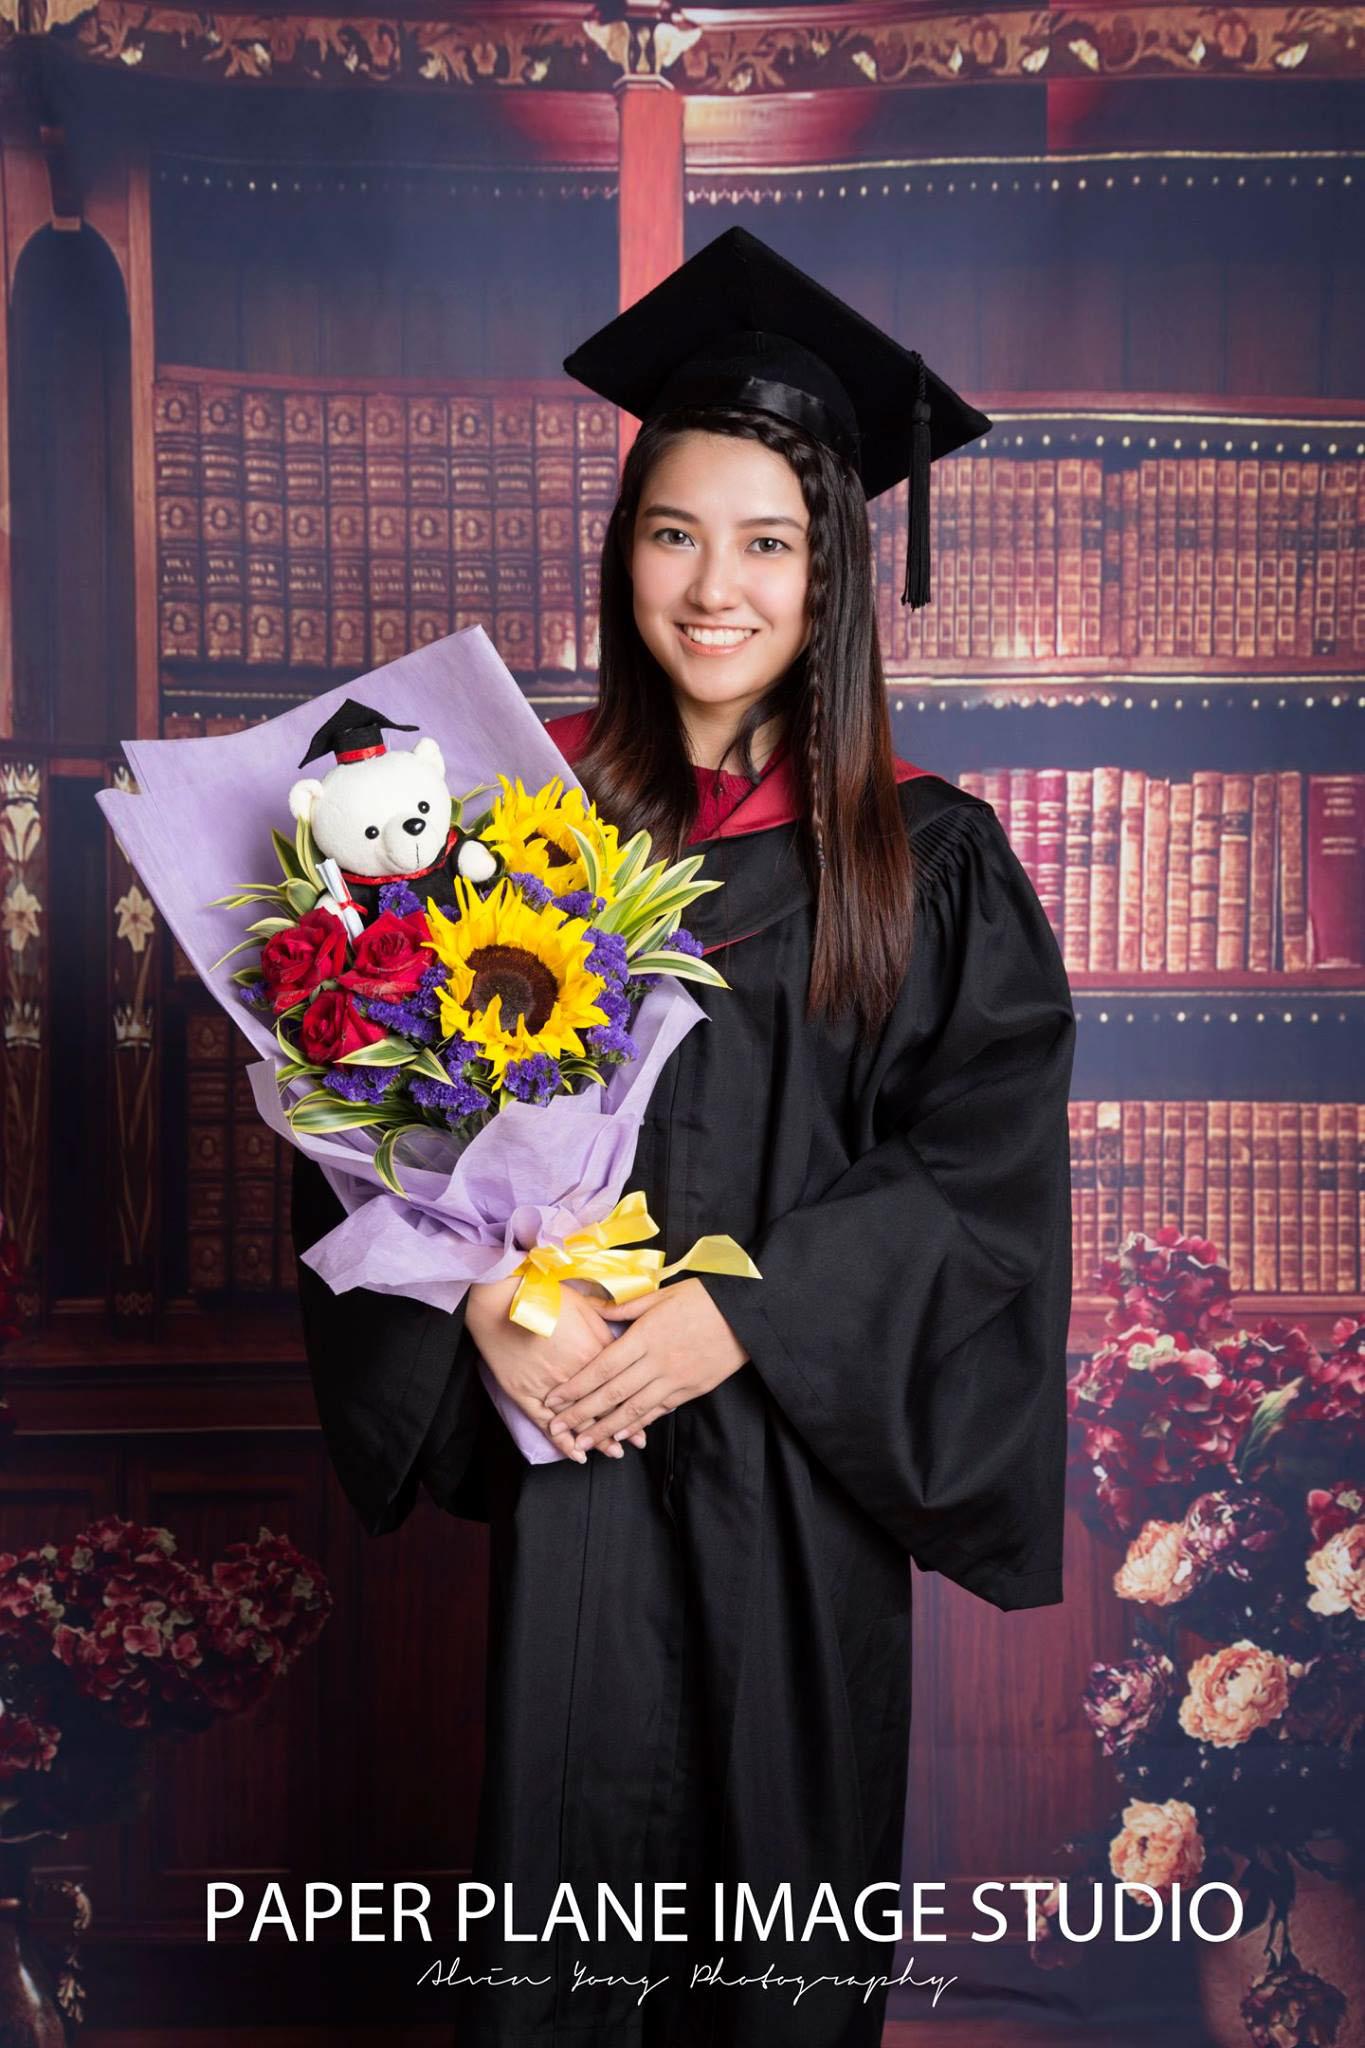 Graduation Photo Shooting, Graduation Video Shooting, Graduation Shooting, Graduation Studio Photography, Graduation Photographer Malaysia, Malaysia Graduation Malaysia, Malaysia Graduation Studio Photography